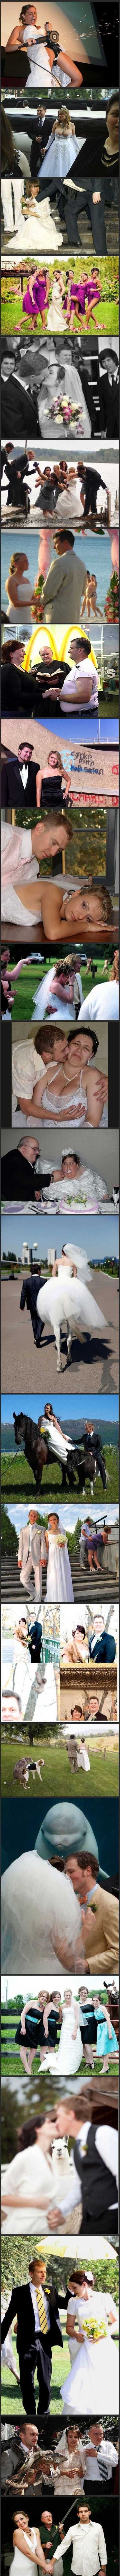 hilariously awful wedding photos